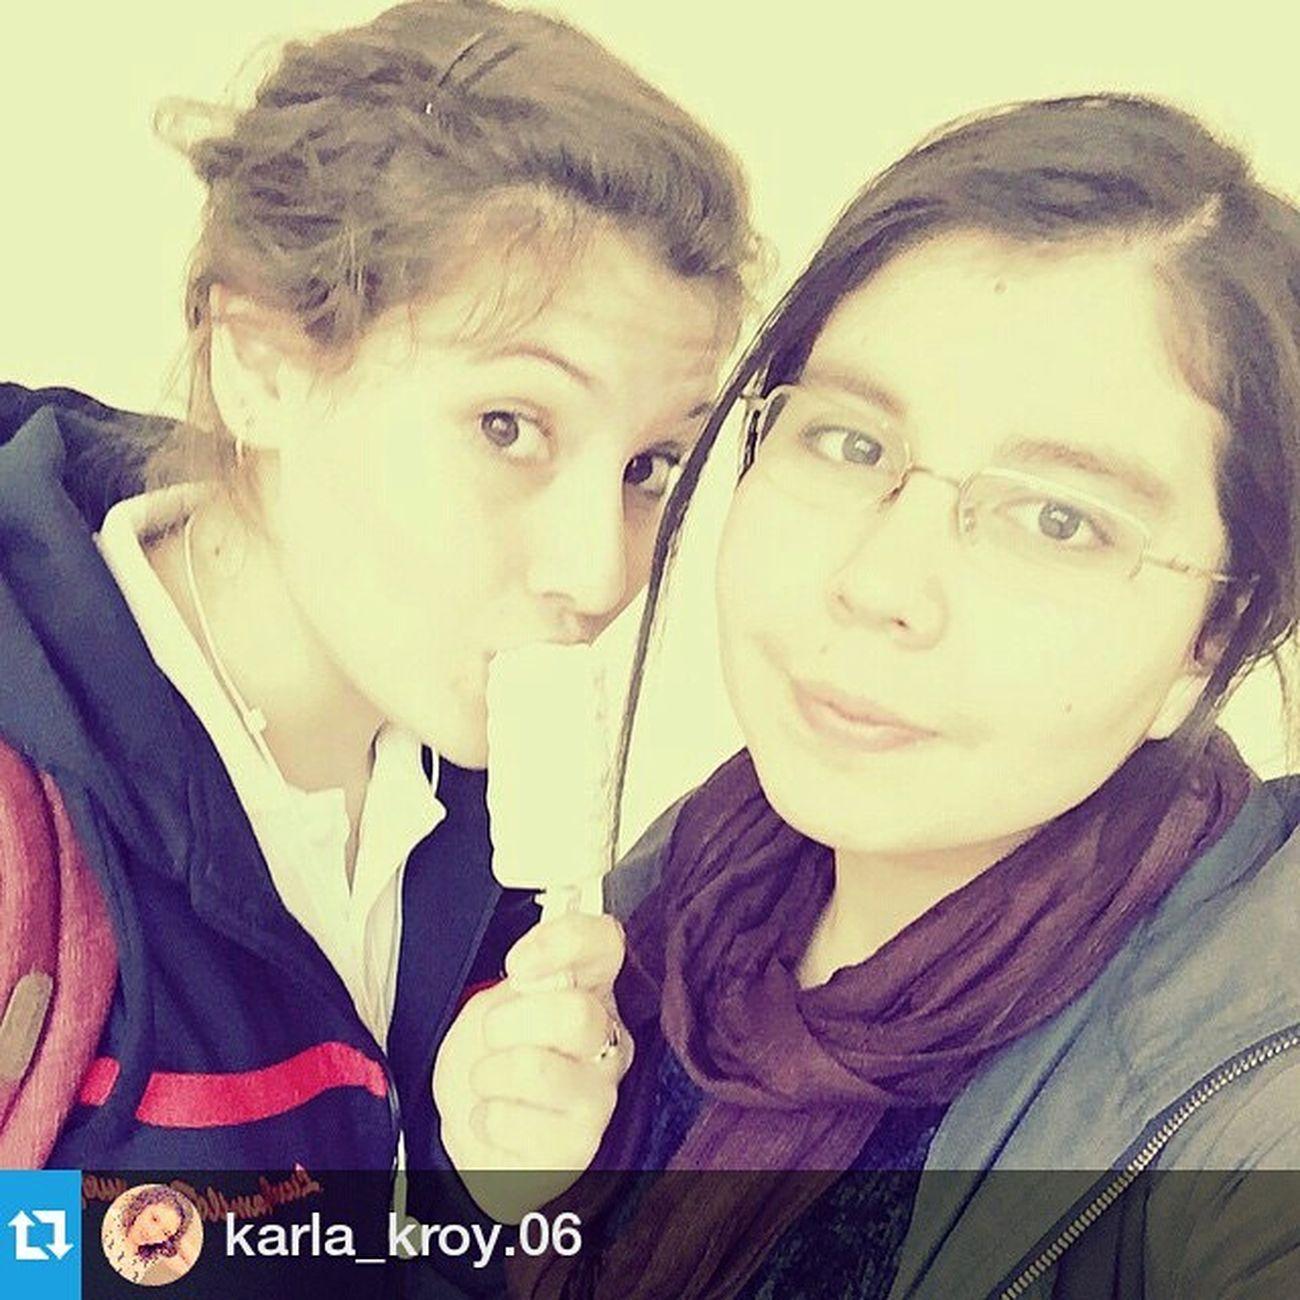 Repost @karla_kroy.06 ・・・ Awww 😋 Heladito Primi te quieruuu 😘 Chileangirl chilegram temuco chile girls